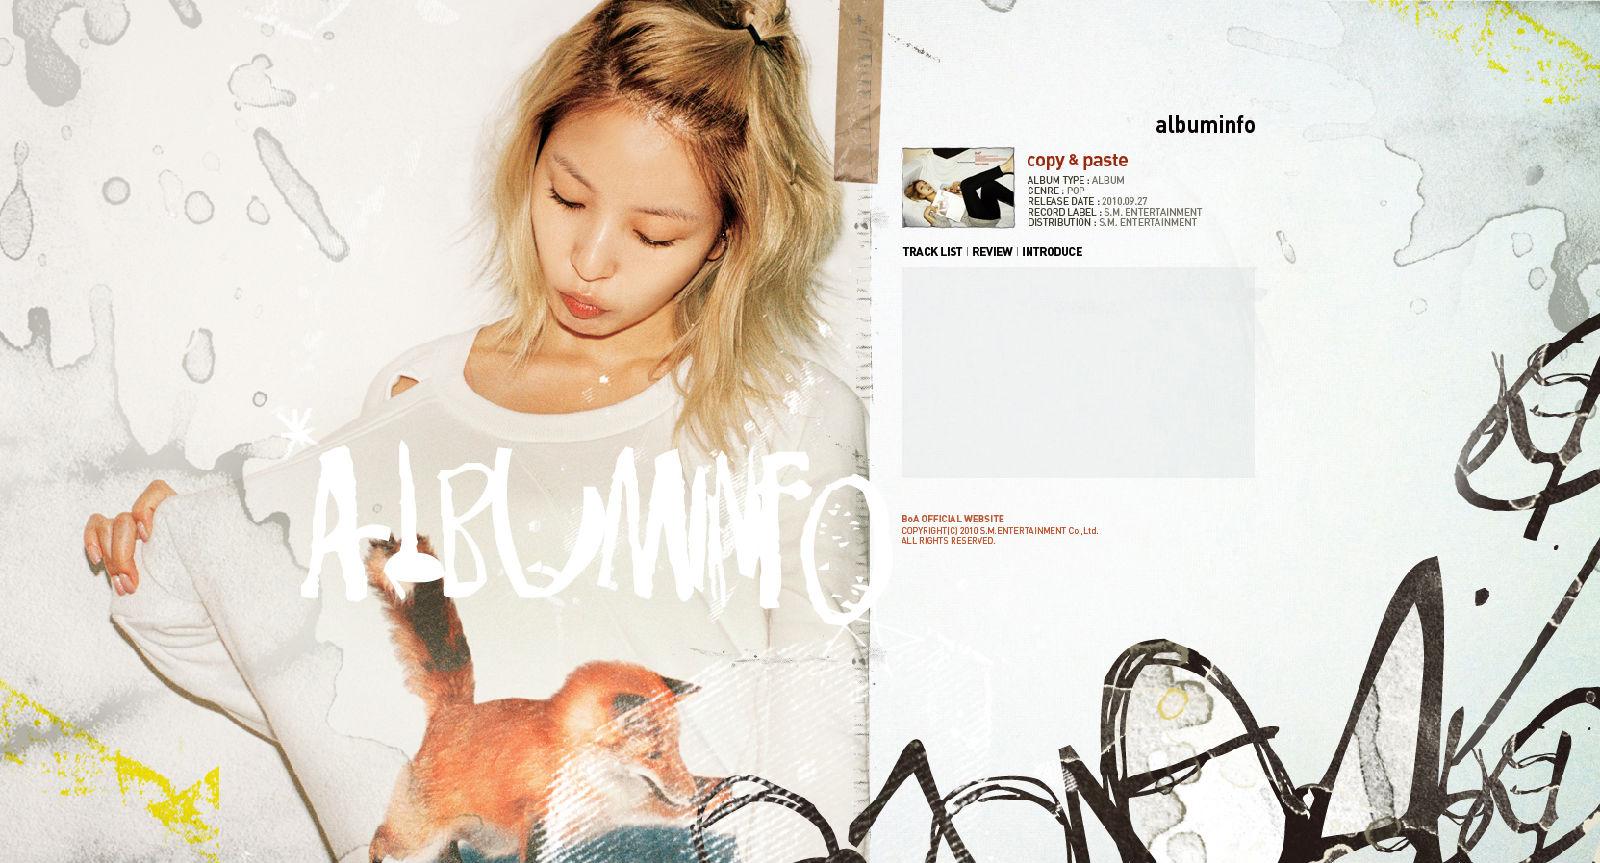 [Pics] COPY & PASTE CD Re-editado + Estilo Web 330735fa11ab74ce9e5146ca